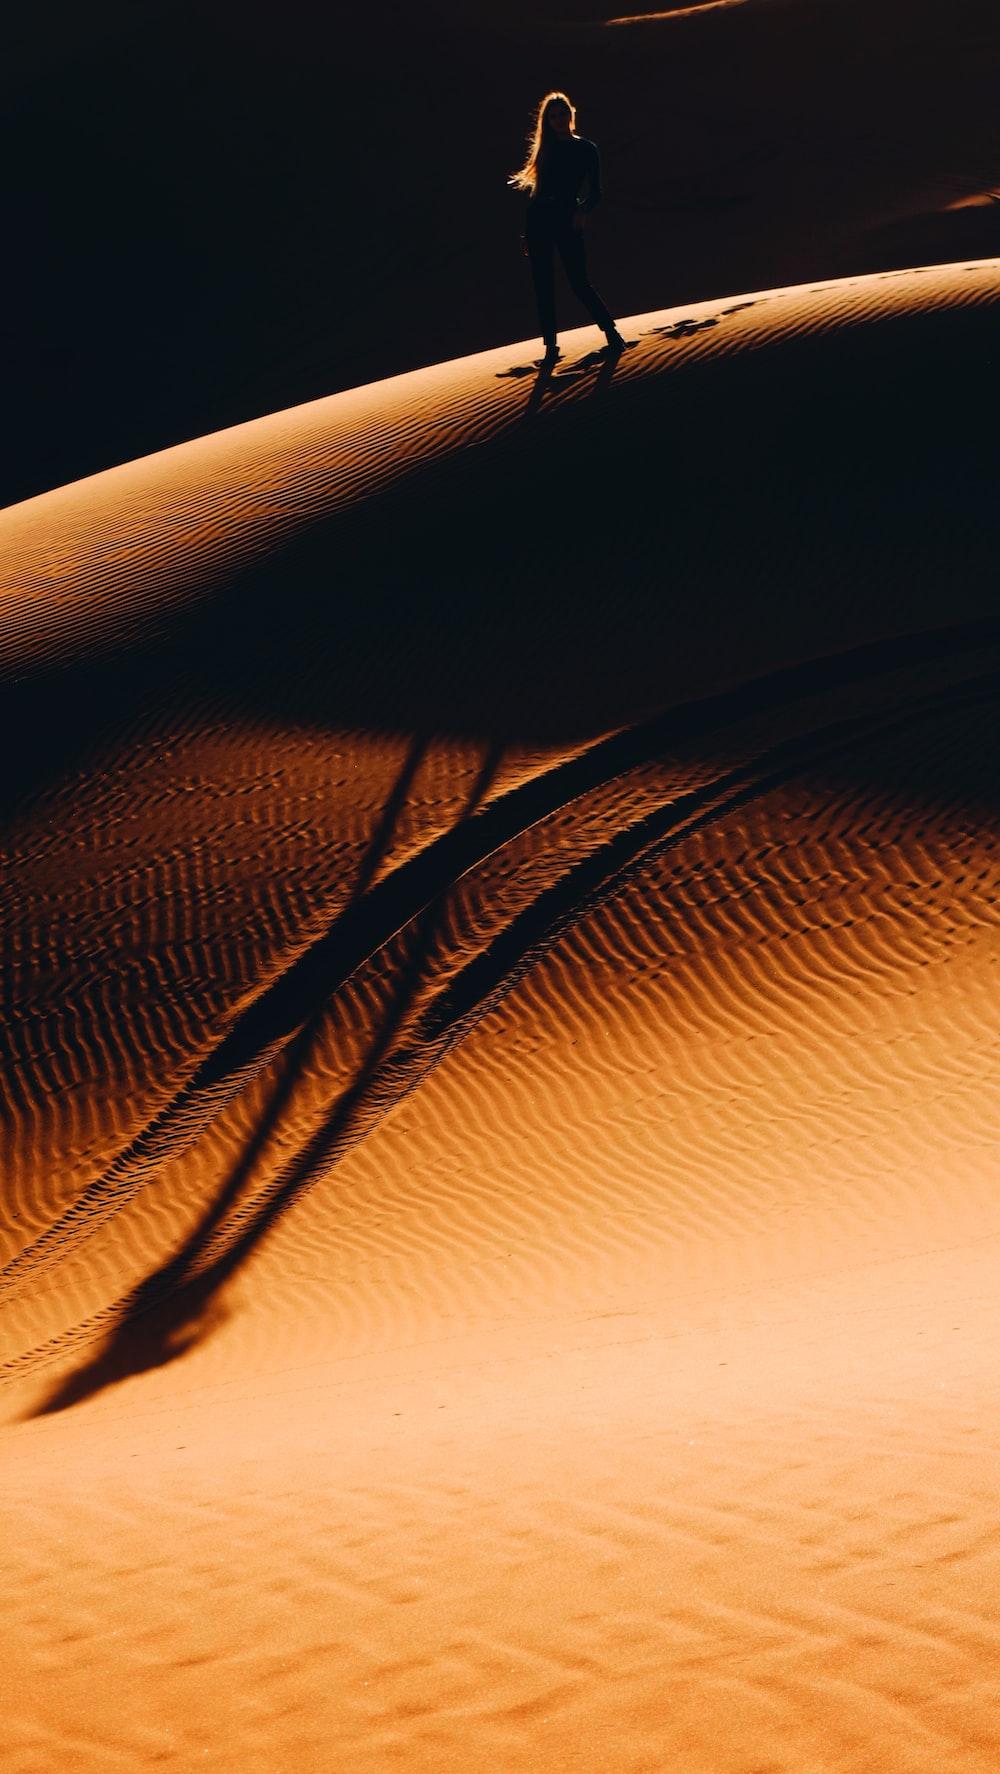 woman walking on desert